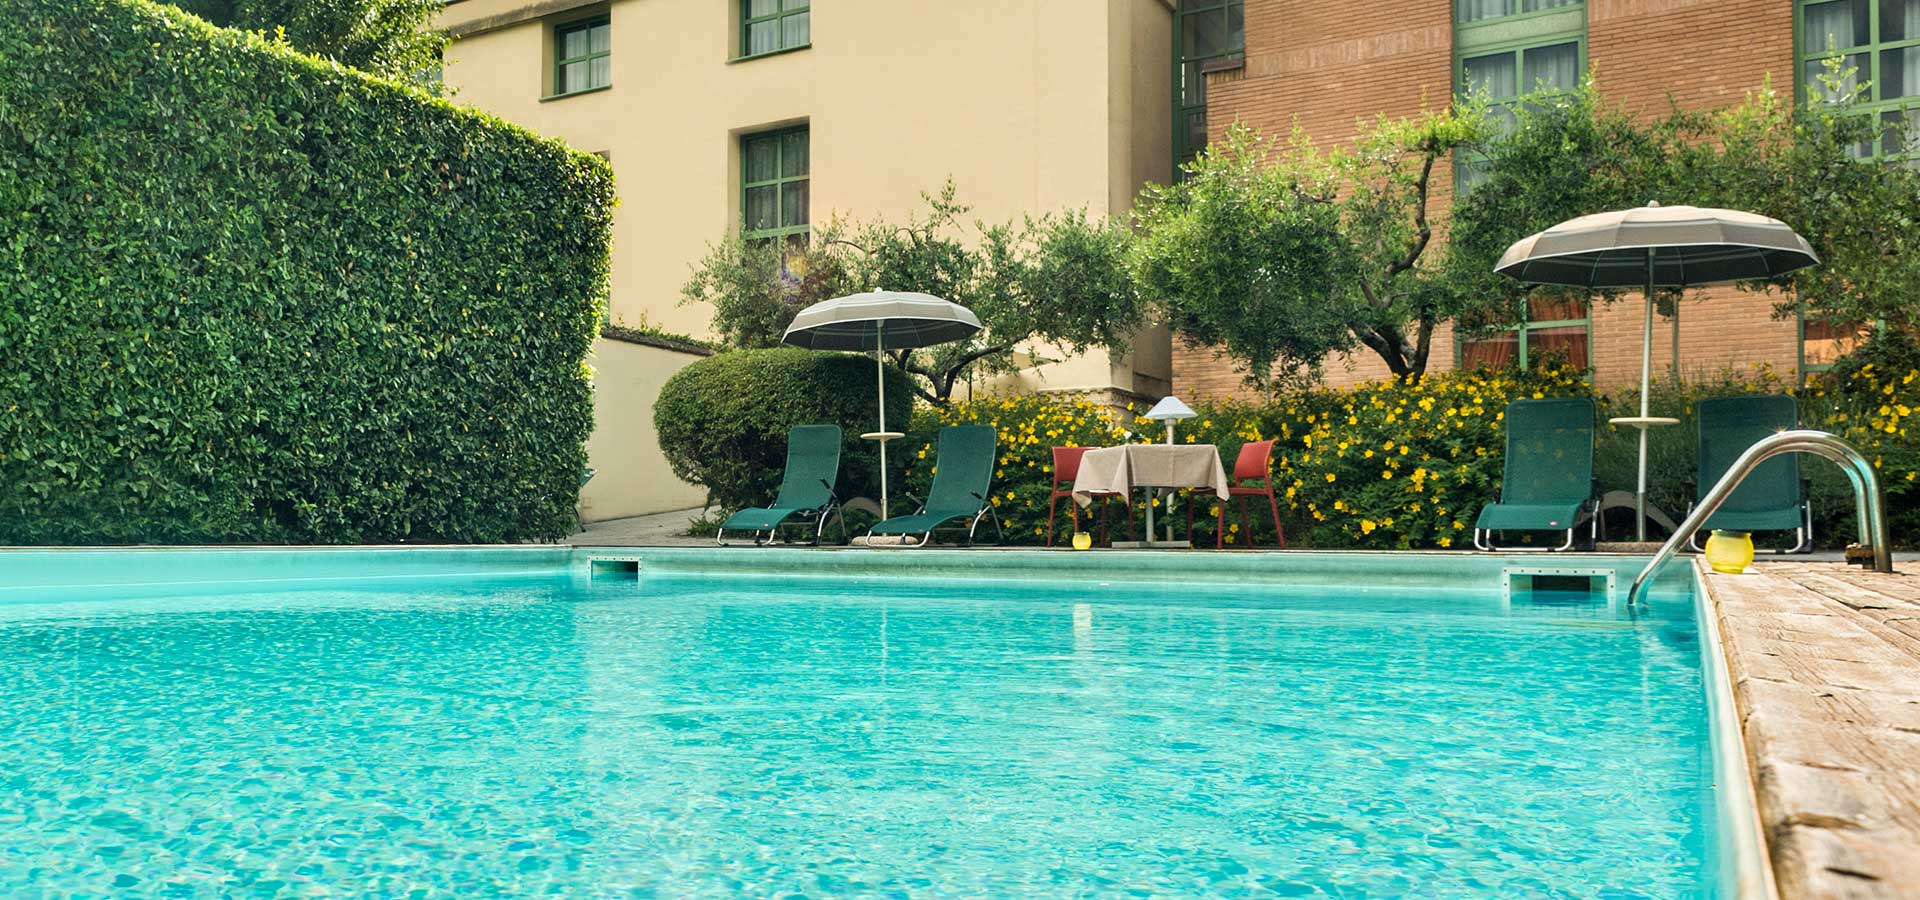 hotel 3 stelle con giardino e piscina a Lucca